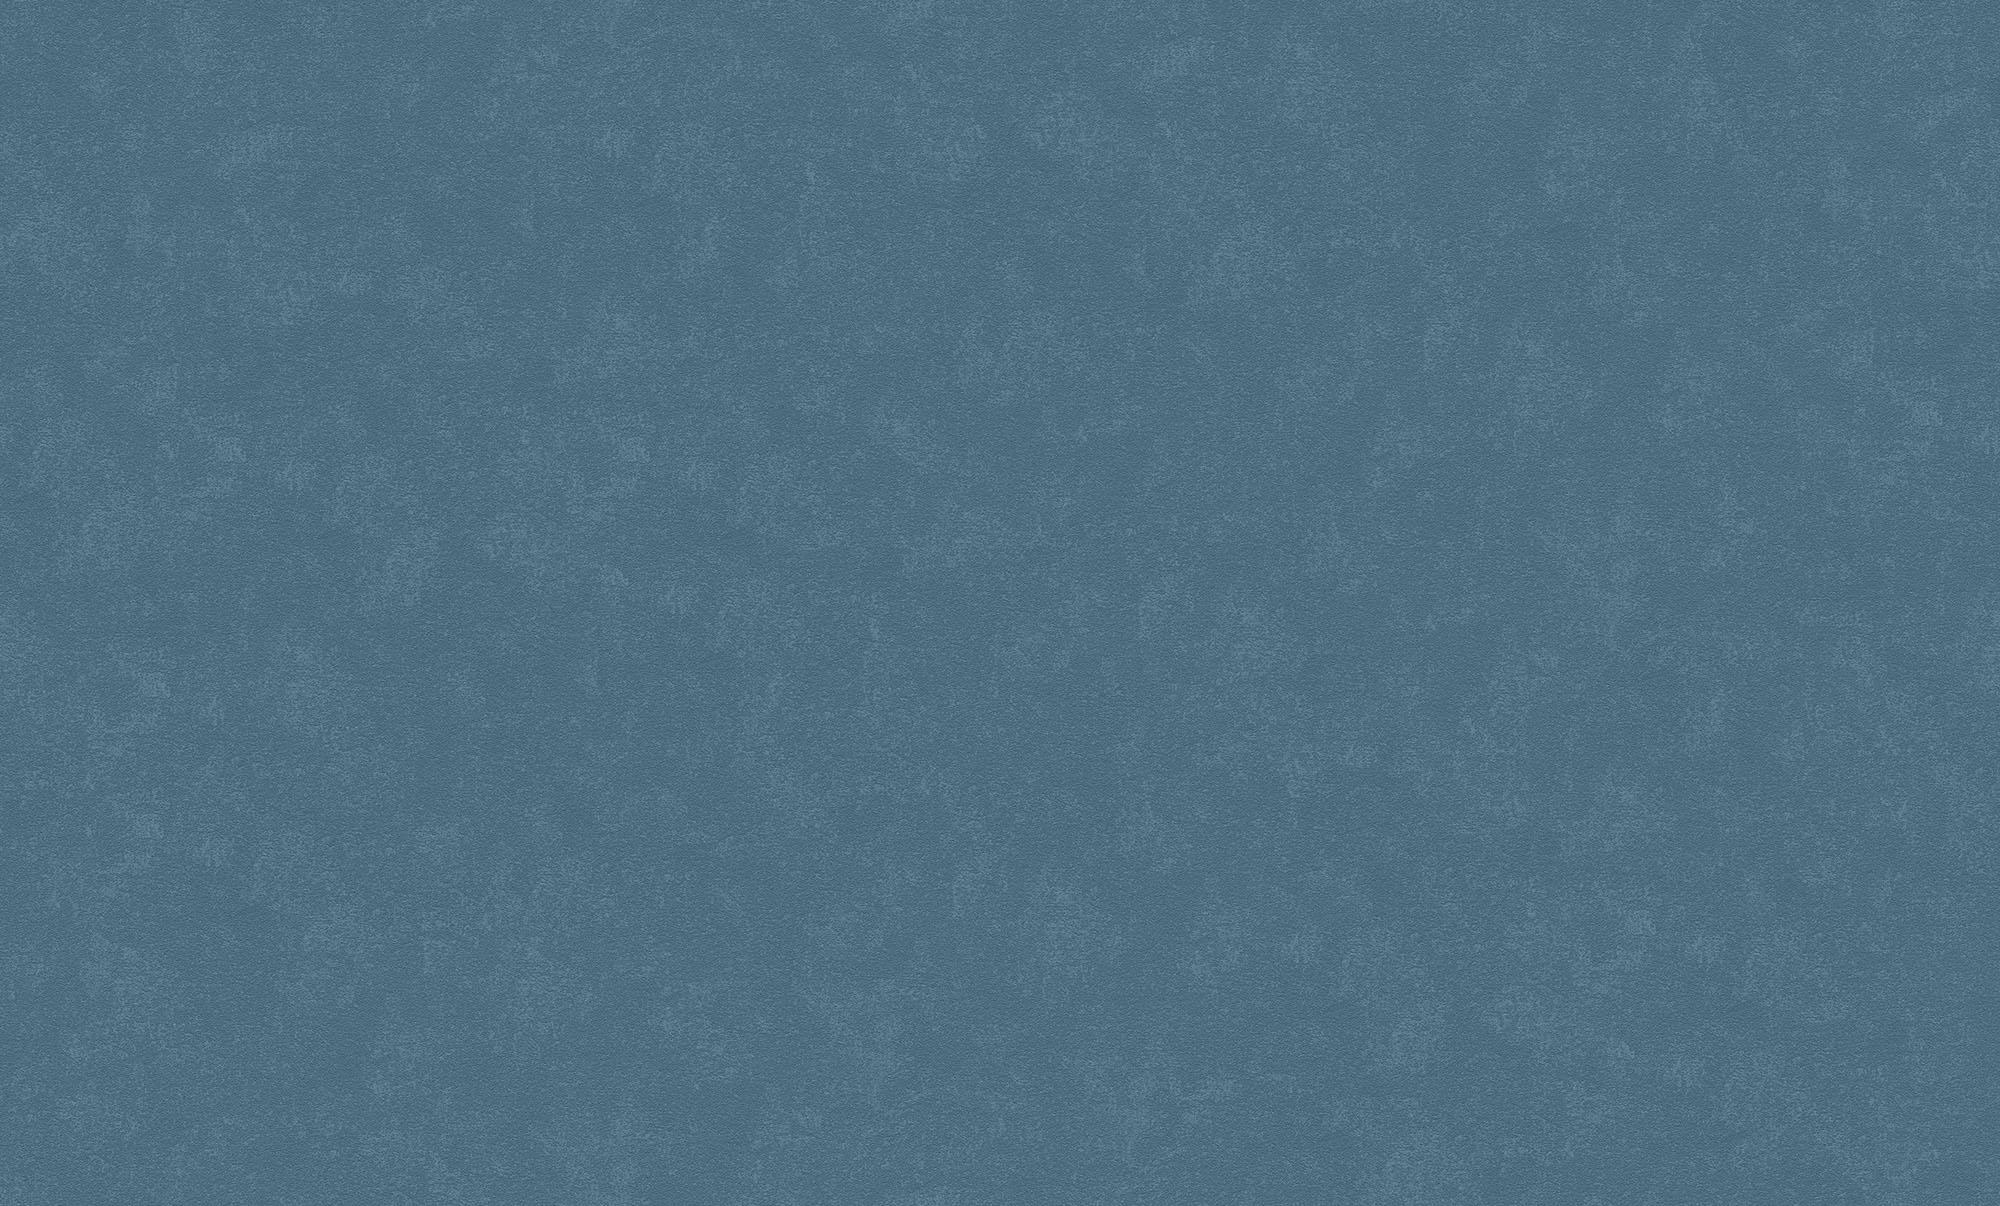 newroom tapete blau grafik modern streifen vlies wei 3d optik ebay. Black Bedroom Furniture Sets. Home Design Ideas